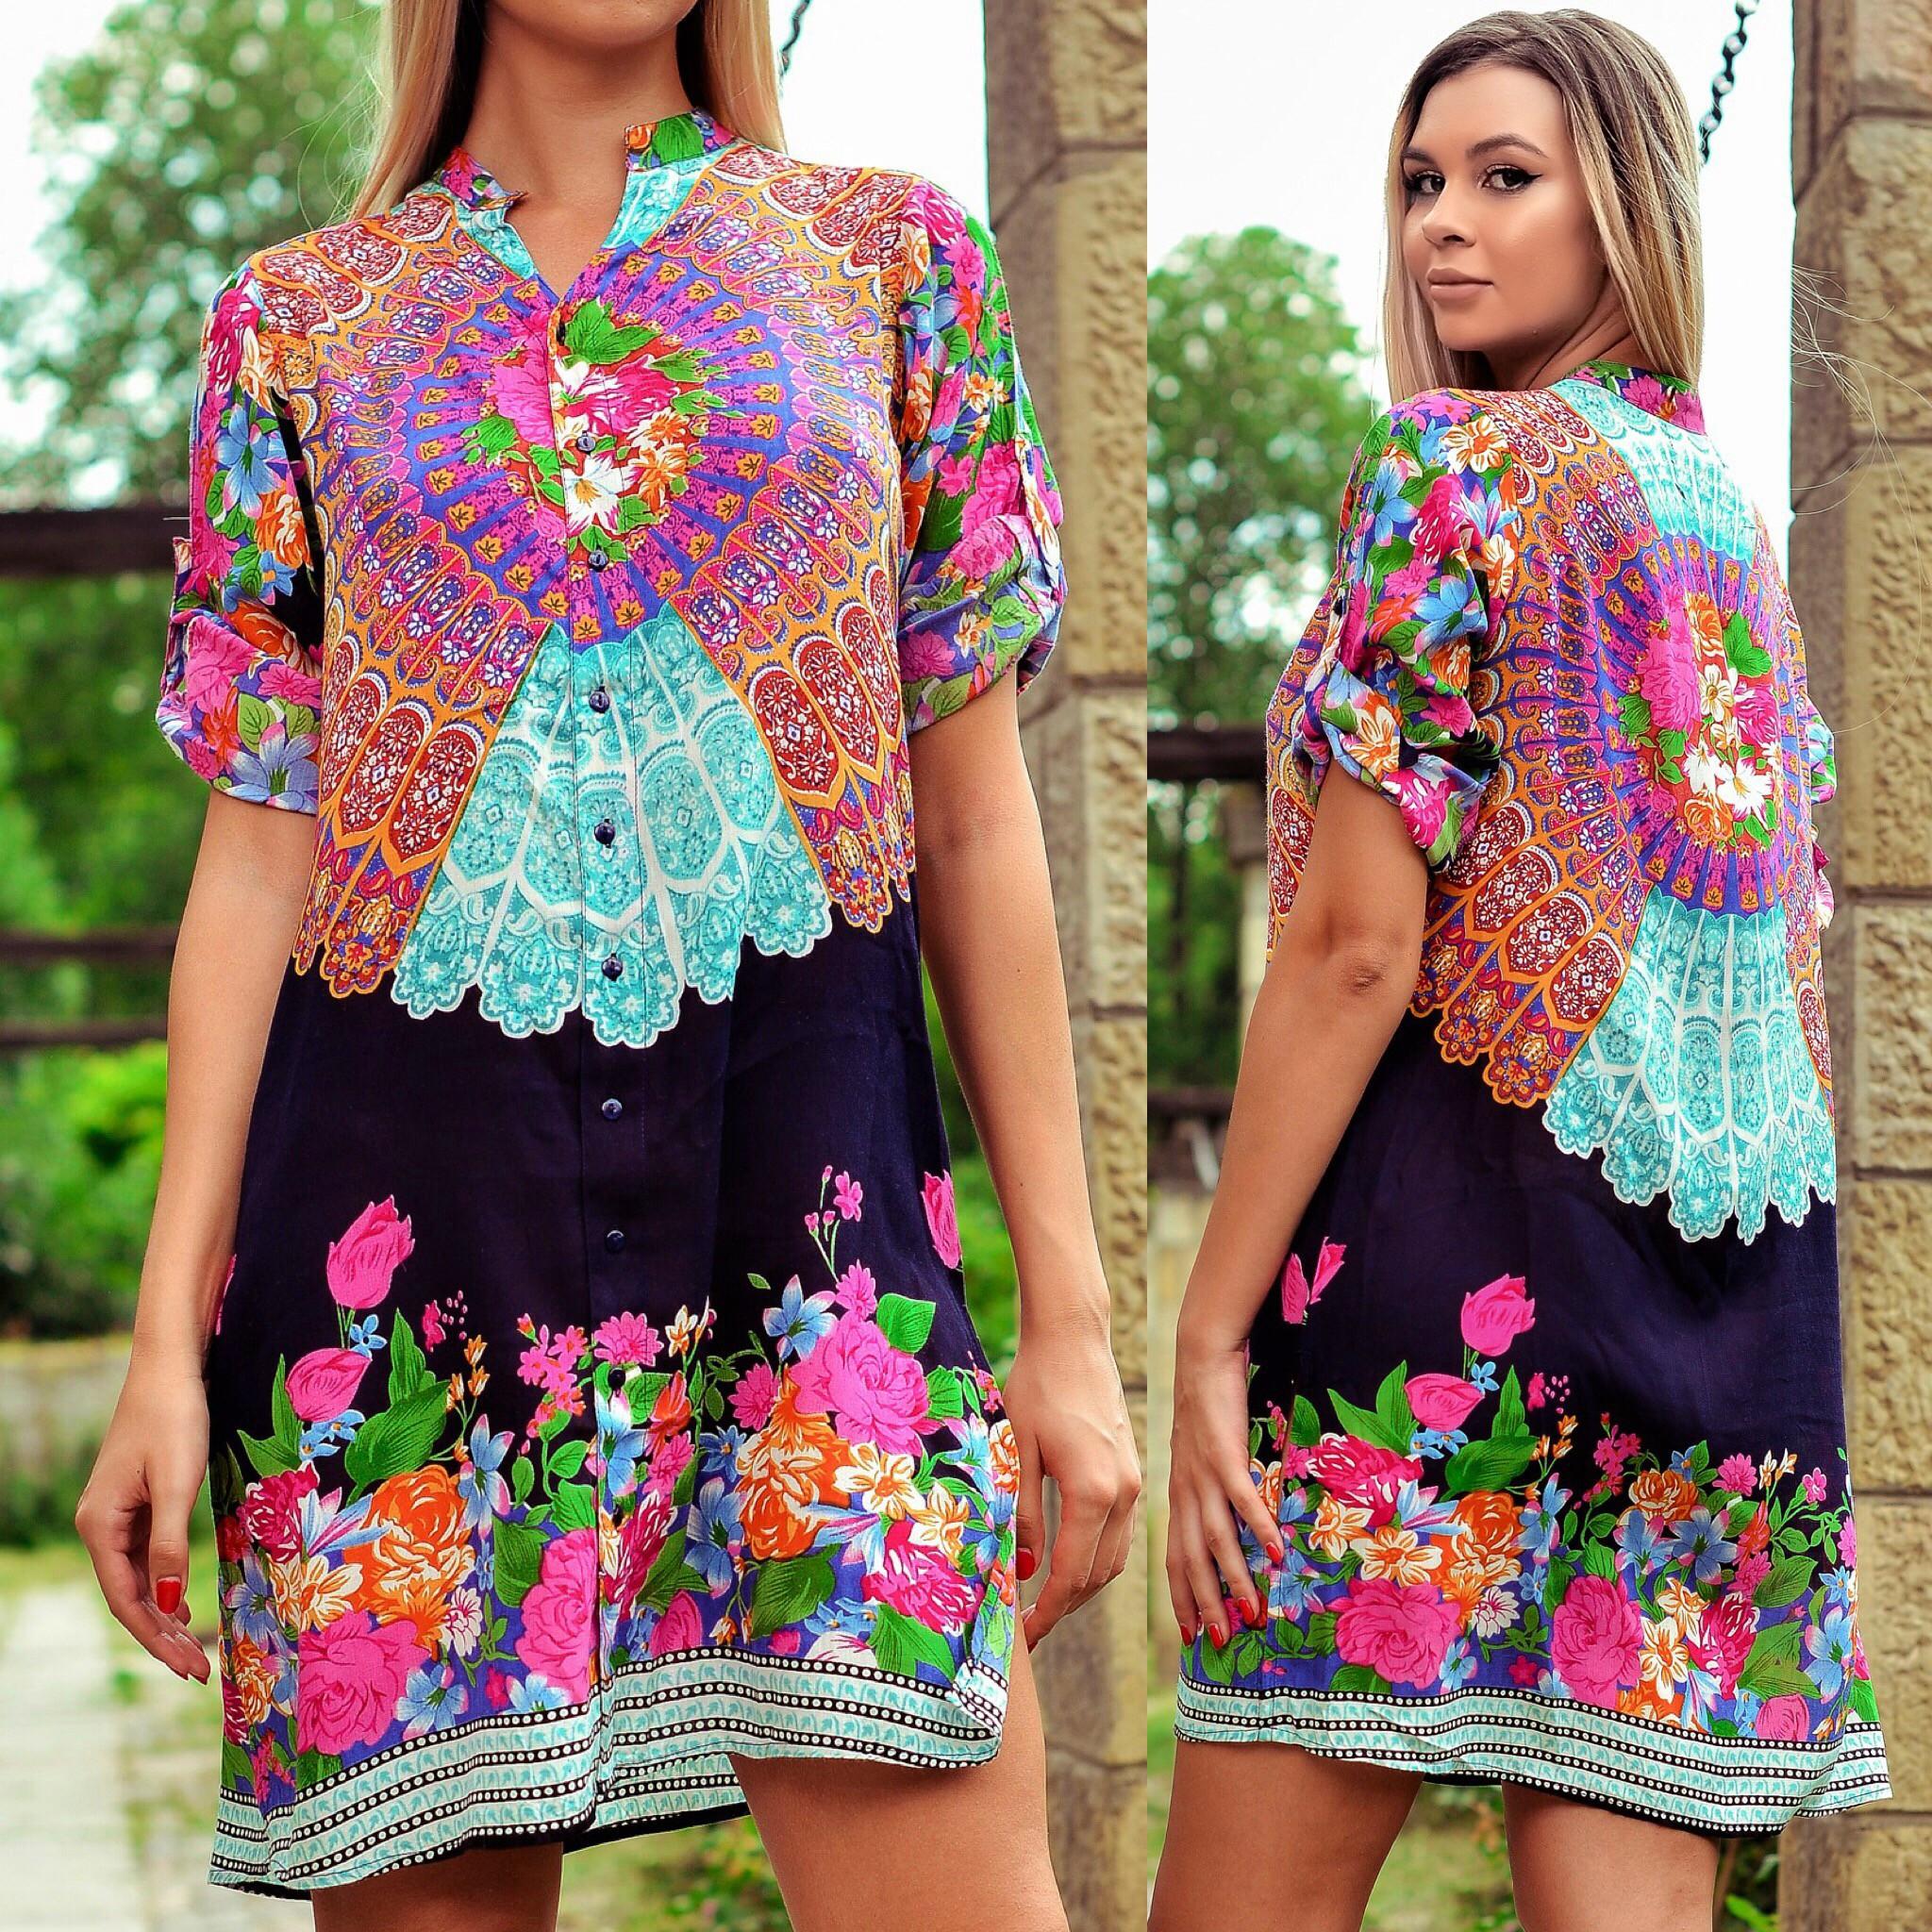 Rochie - camasa cu imprimeu floral - Jasmine